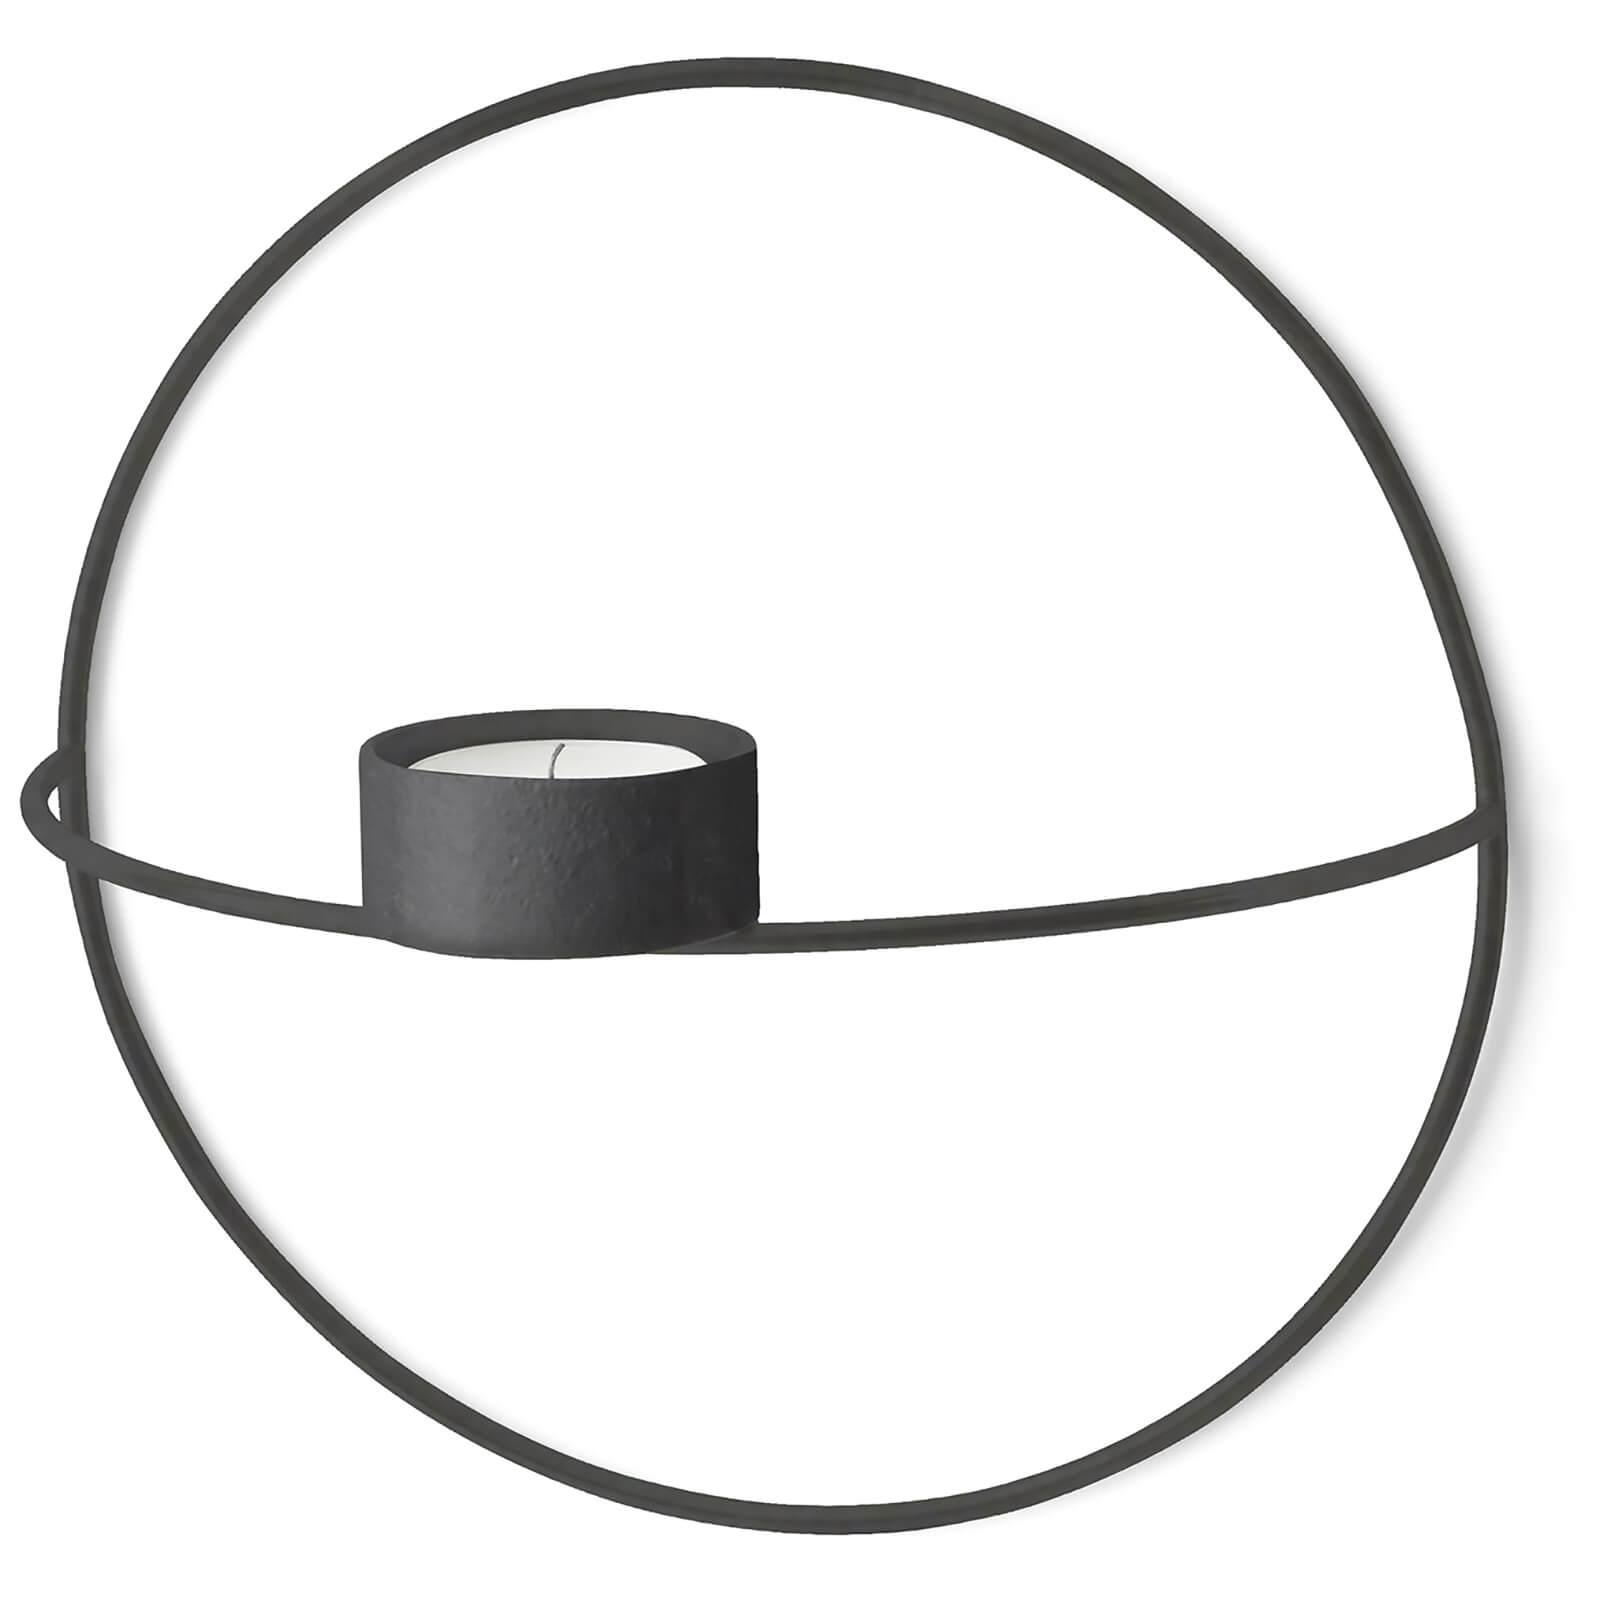 Menu POV Circle Tealight Candle Holder - Black